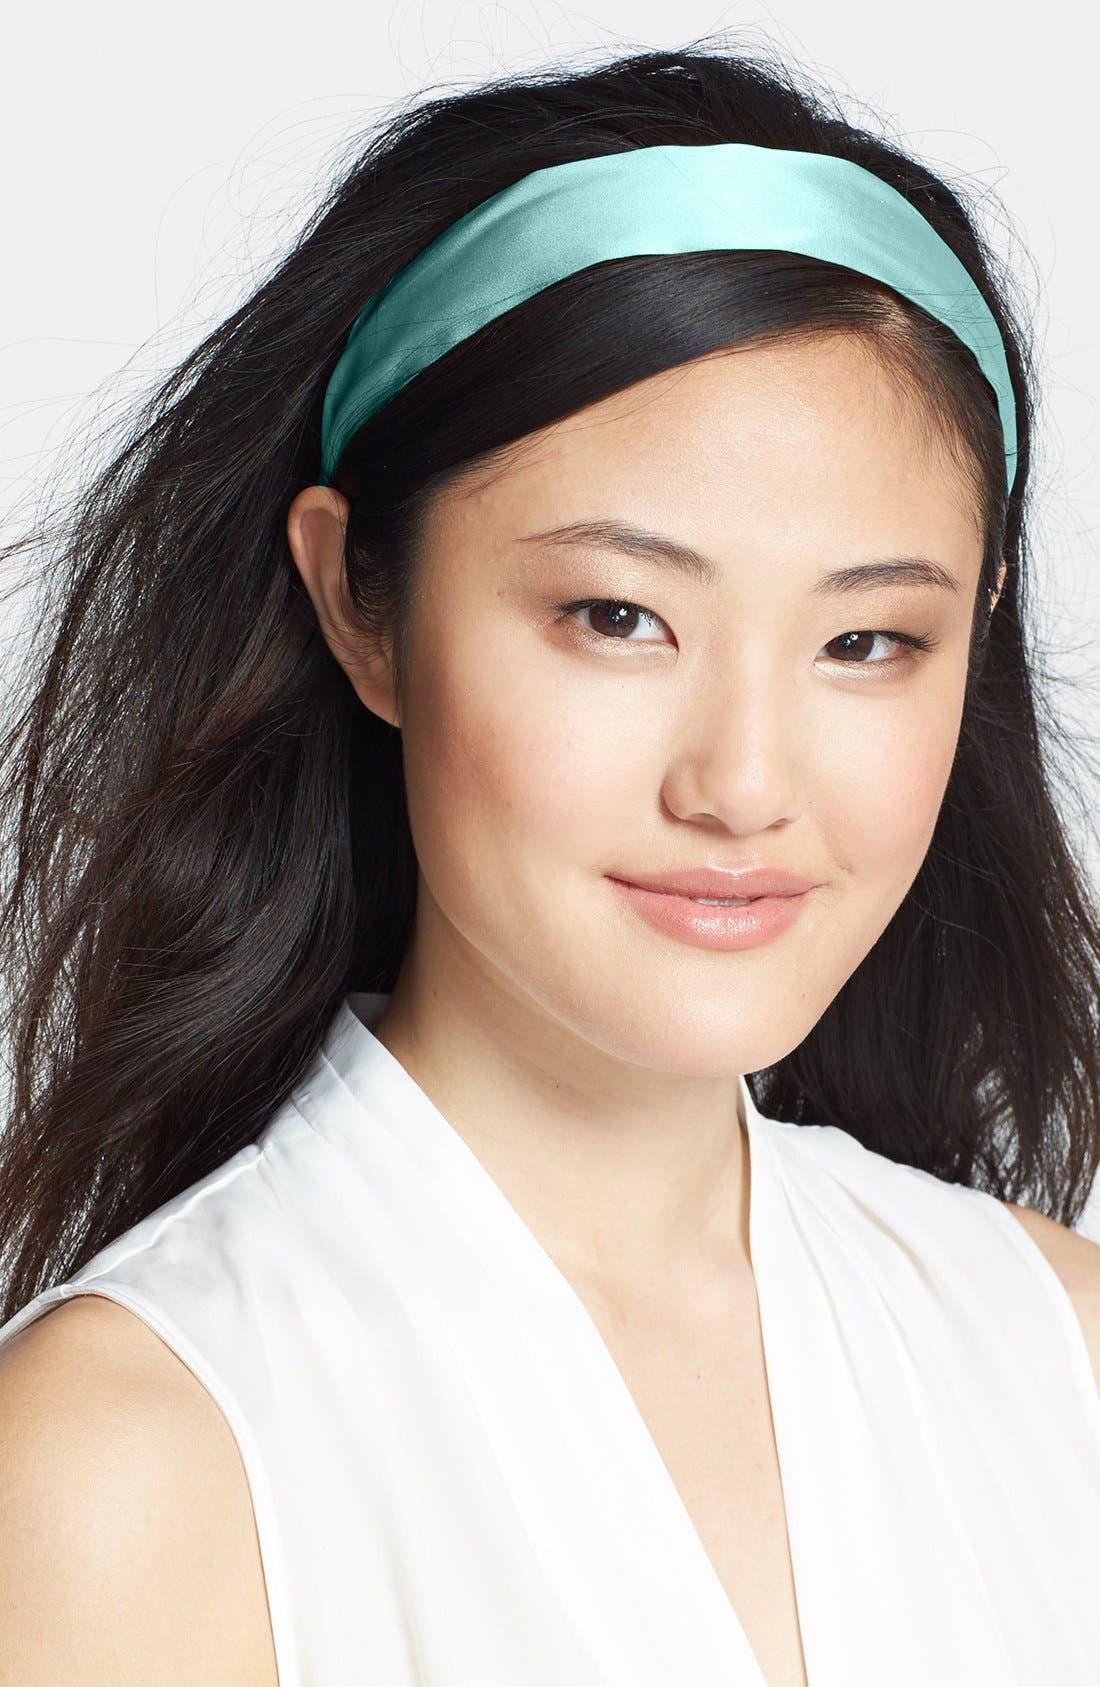 Alternate Image 1 Selected - L. Erickson Silk Scarf Headband